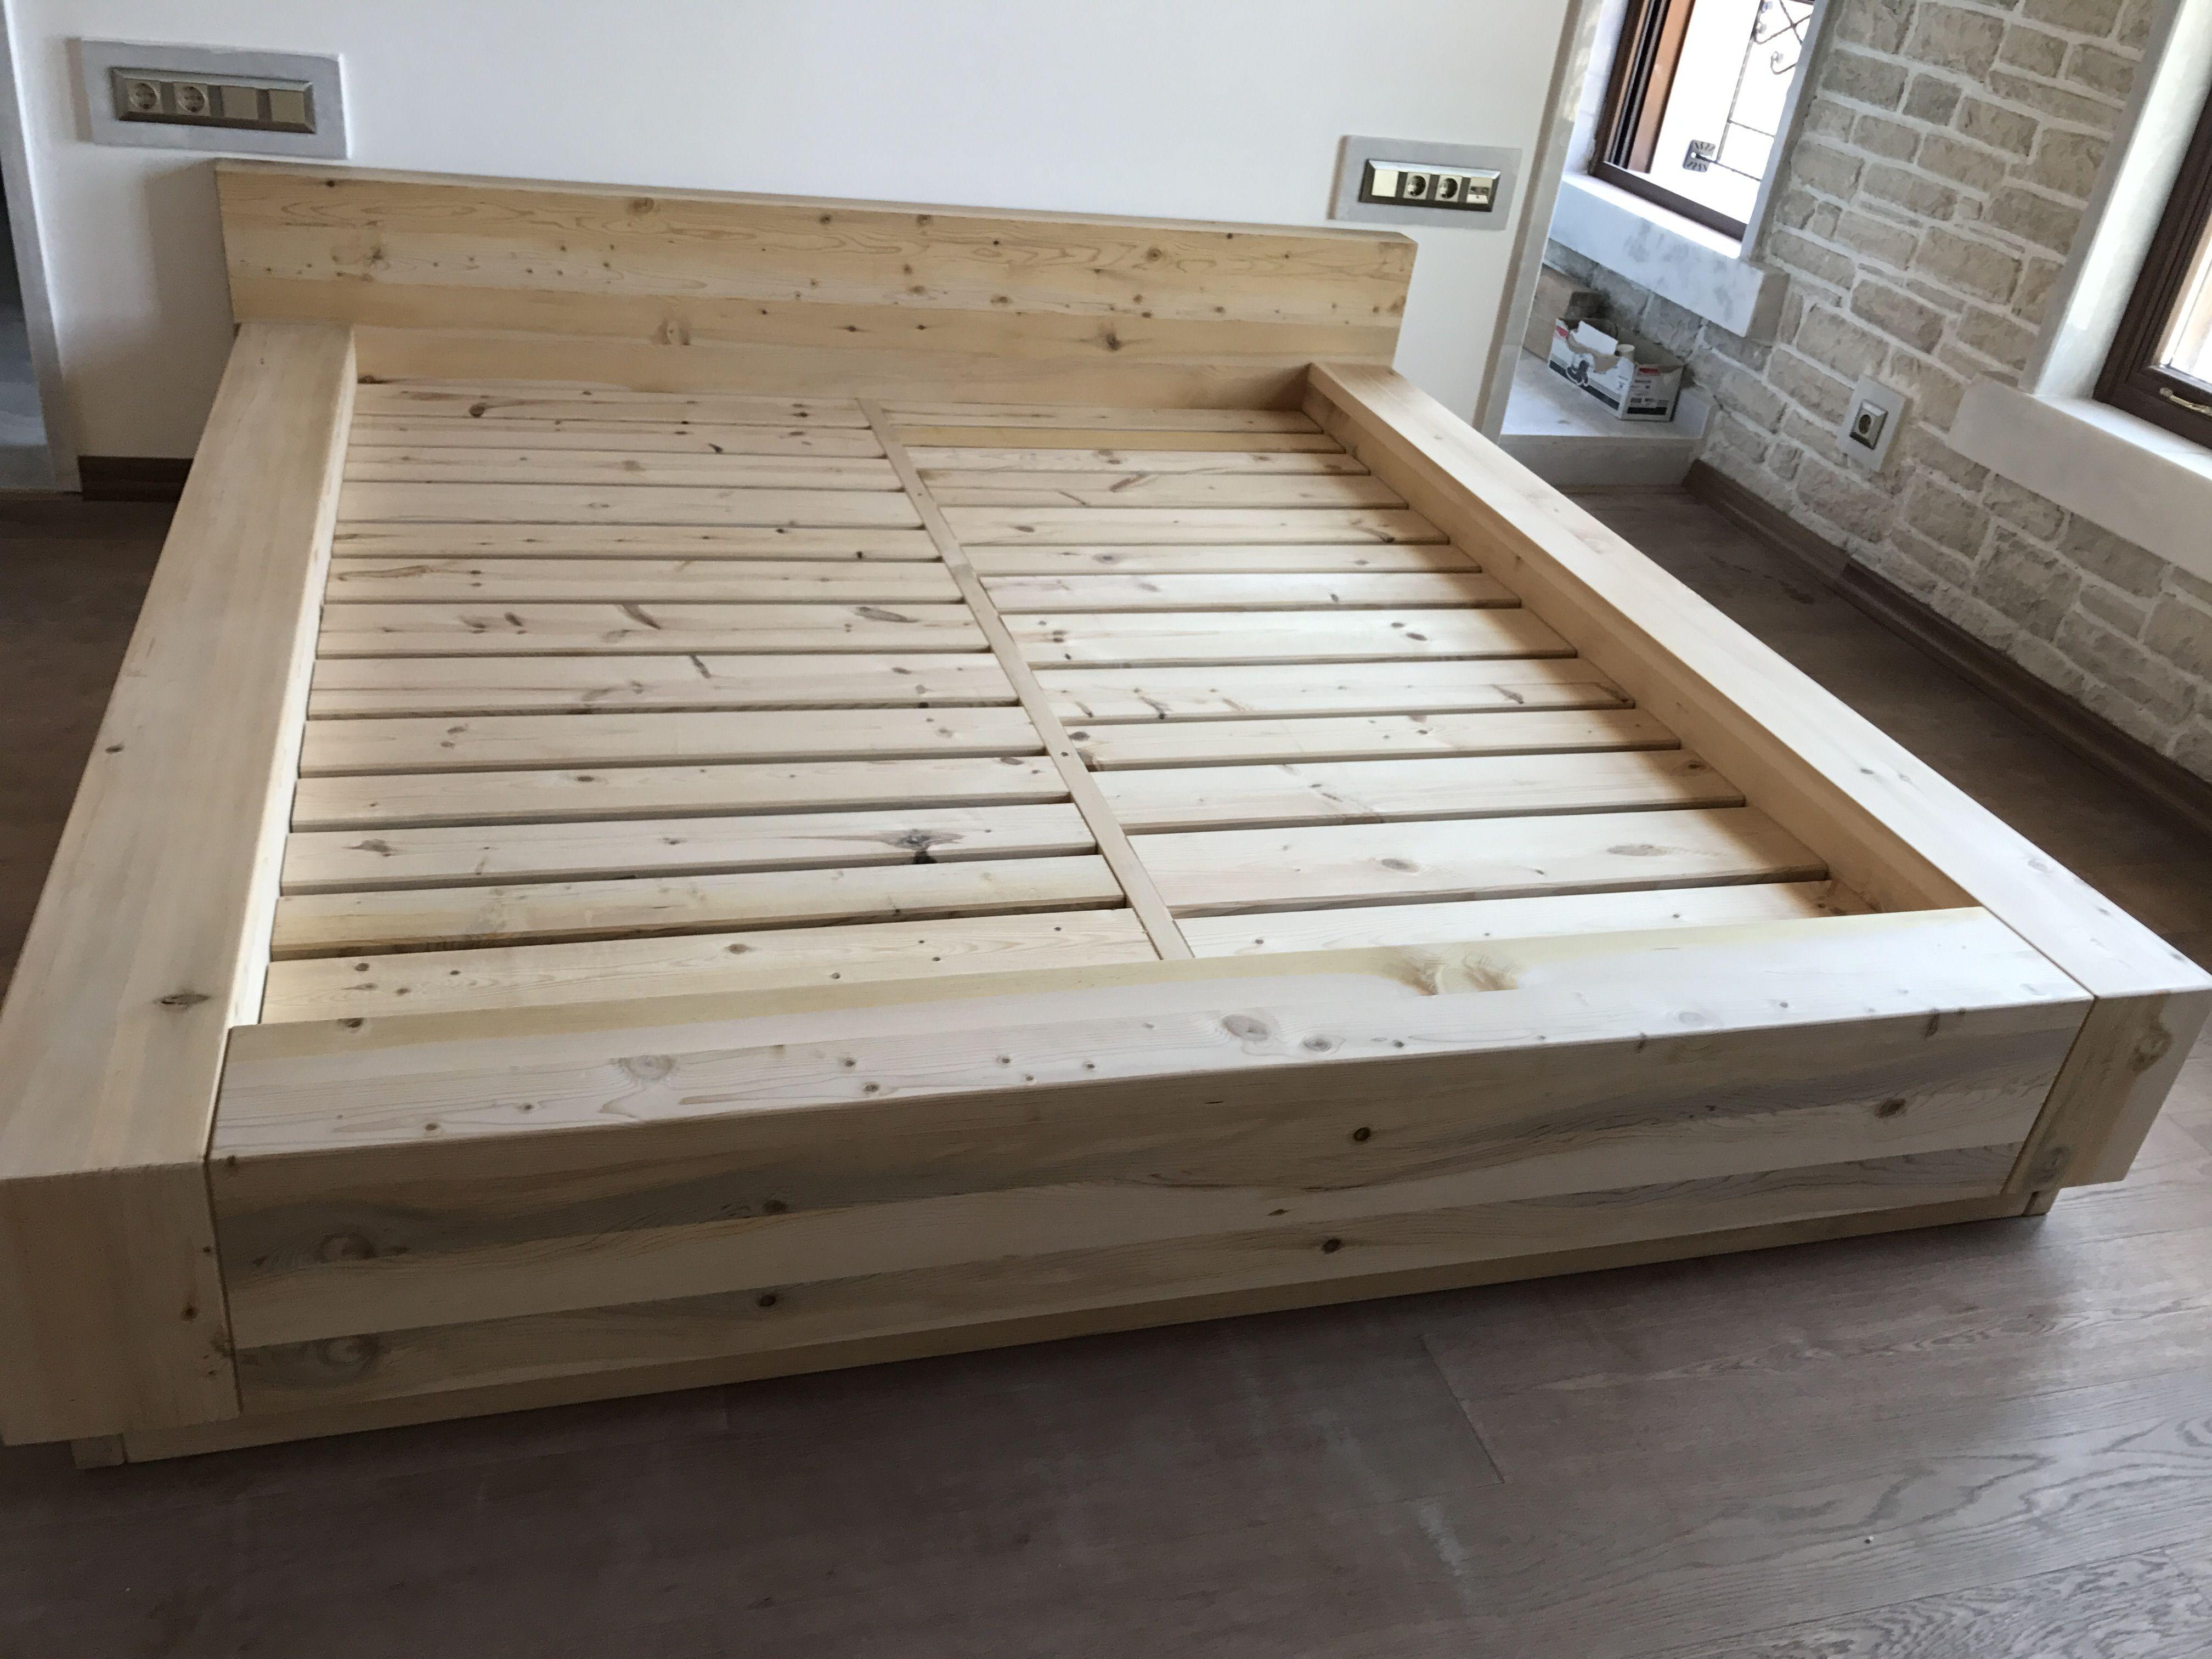 Pin By Brianna Keller On Denenecek Projeler Wood Bed Frame Bed